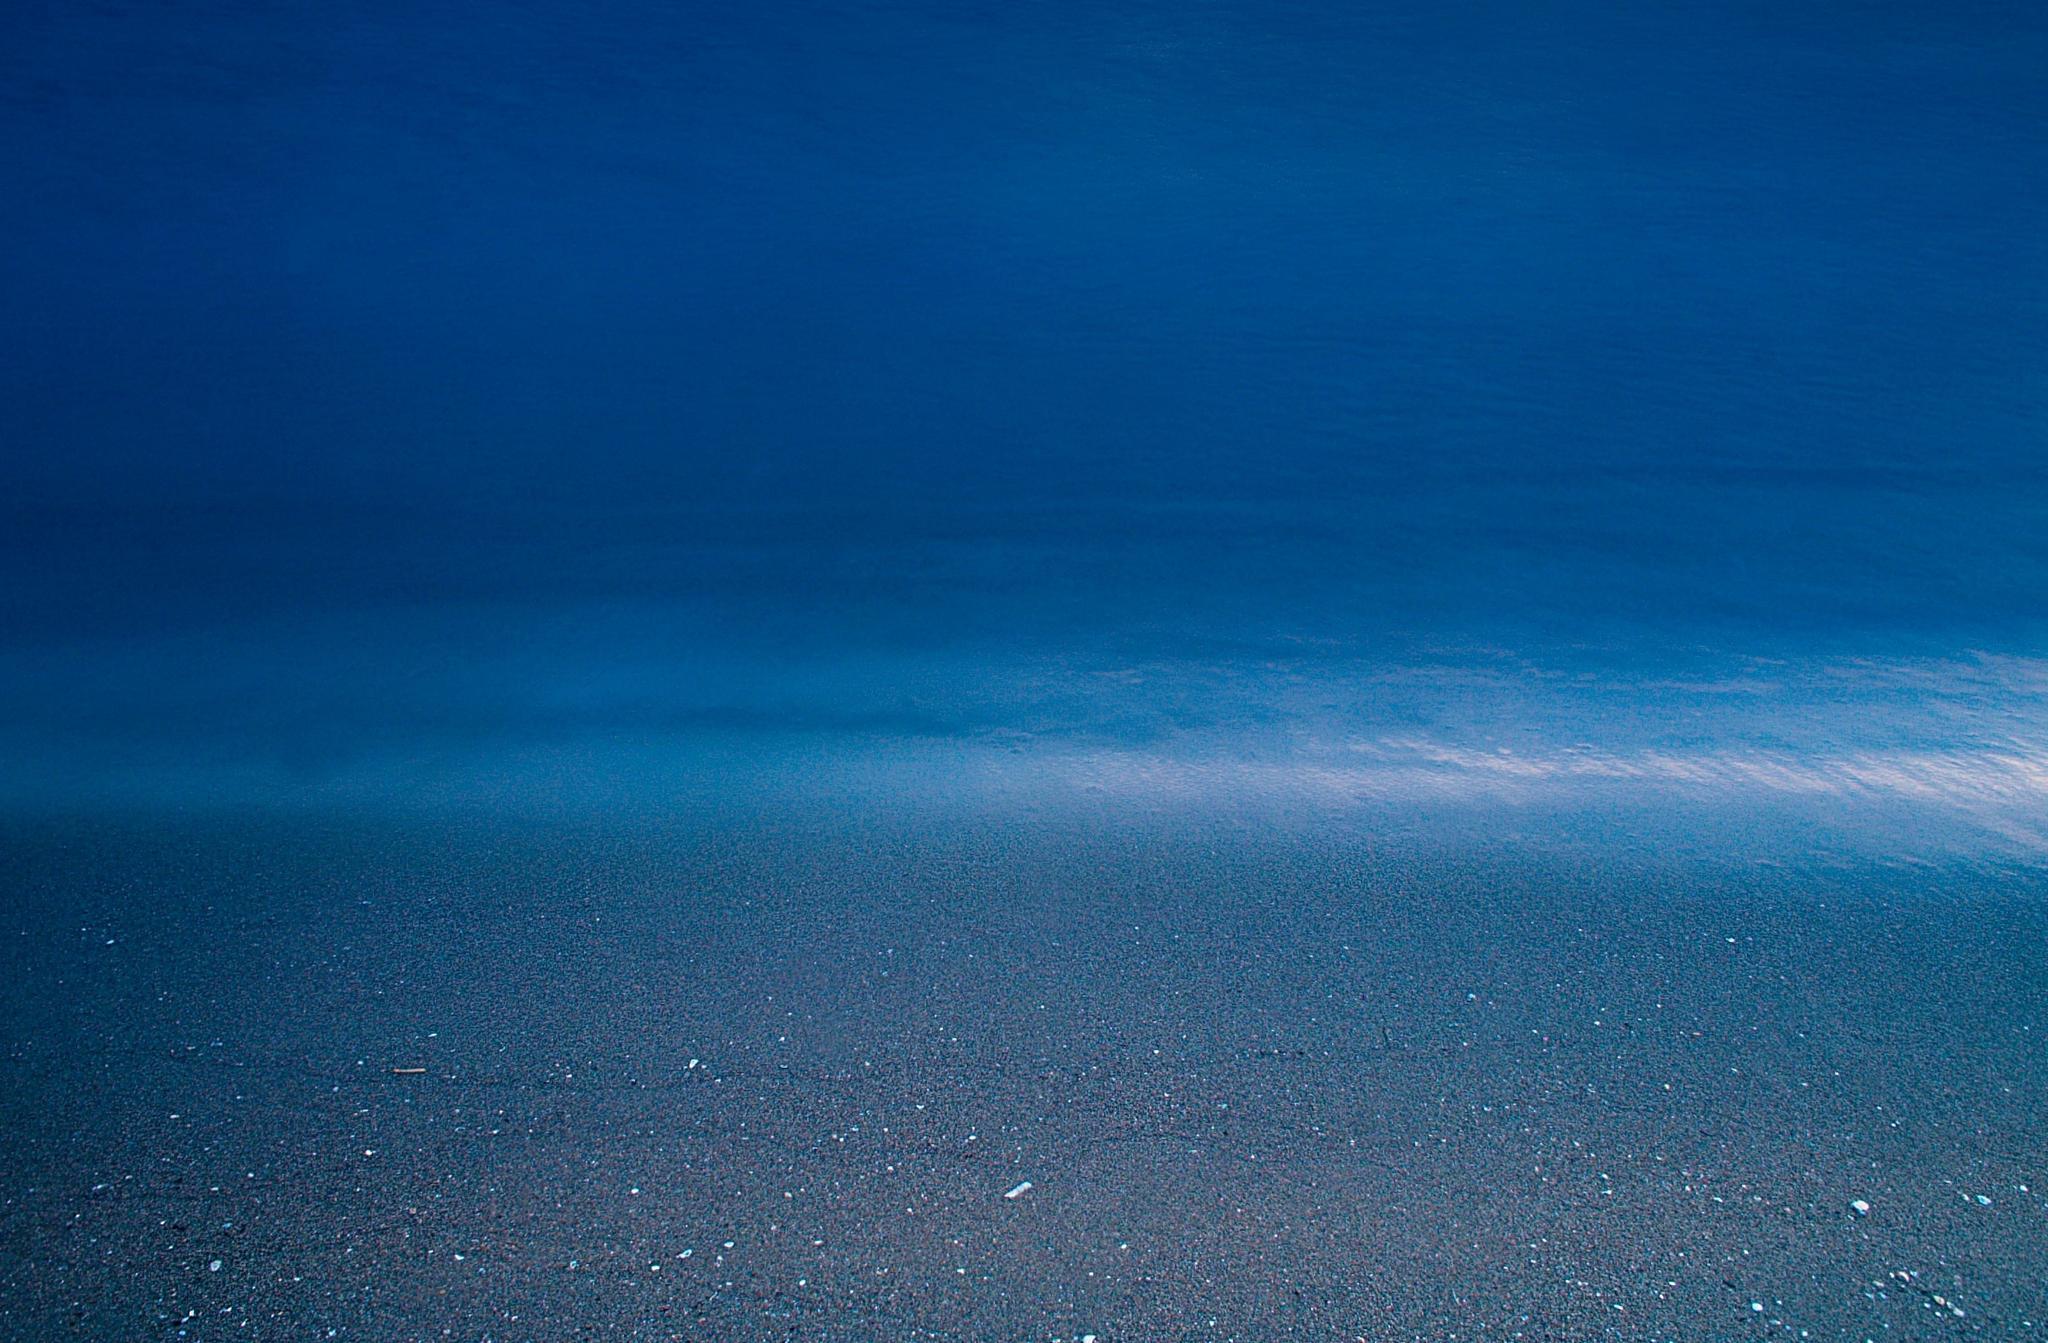 Untitled by Milos Jacimovic